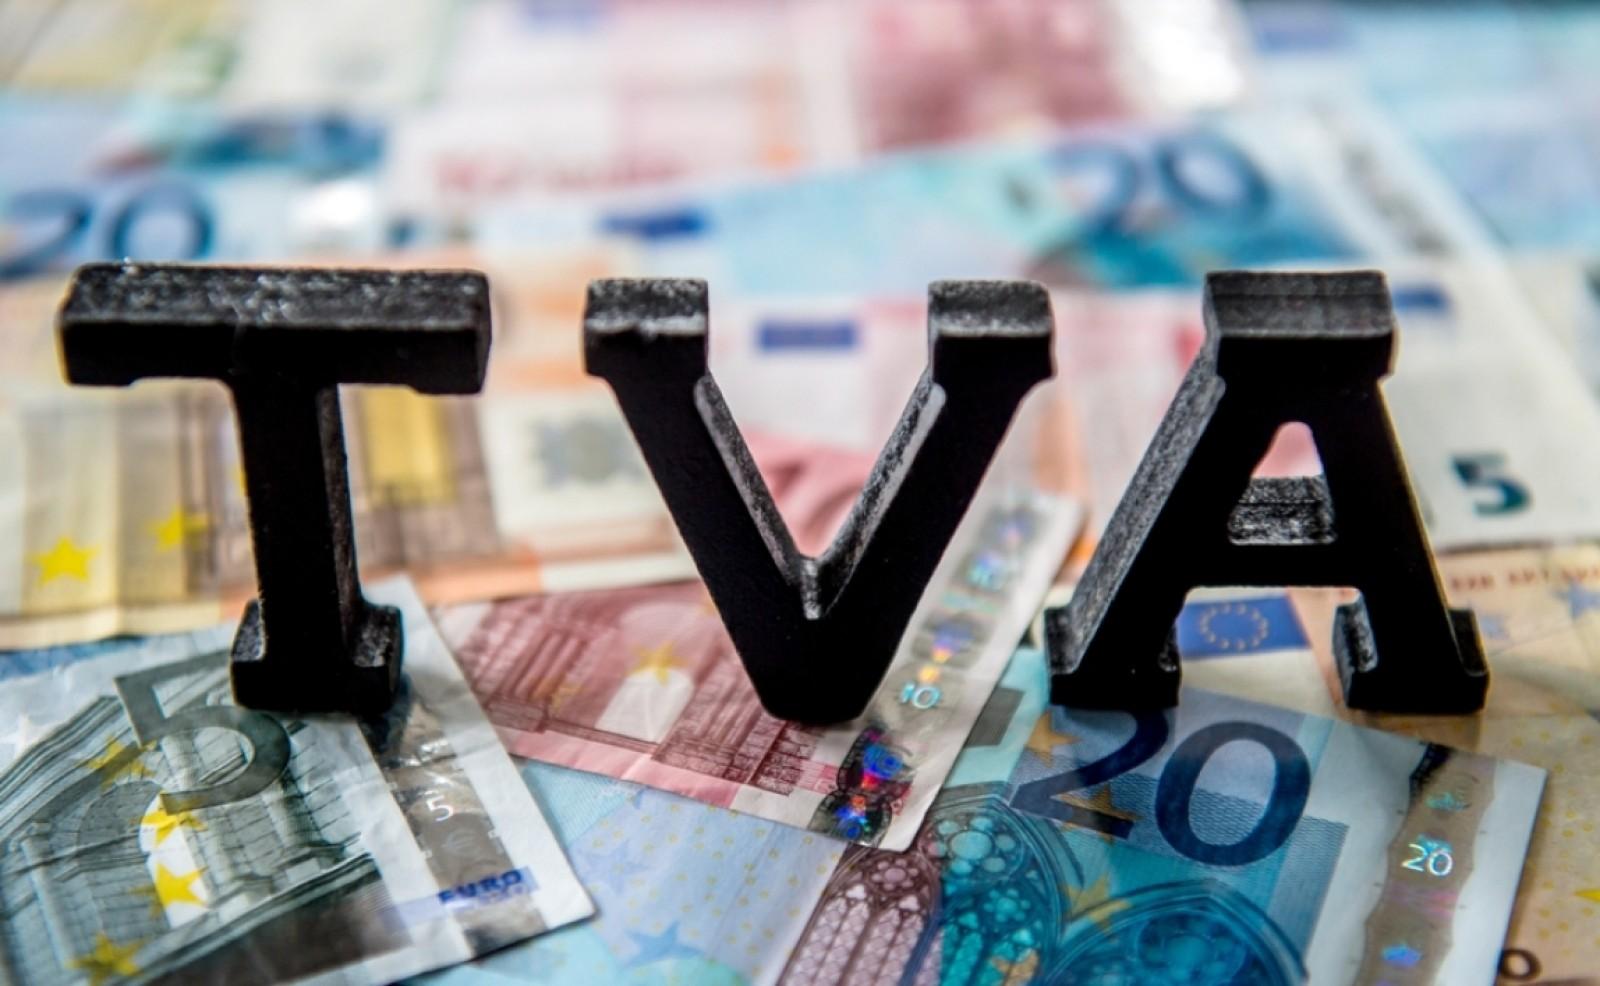 Cota TVA ar putea  sa scada la 18% din 1 ianuarie 2019